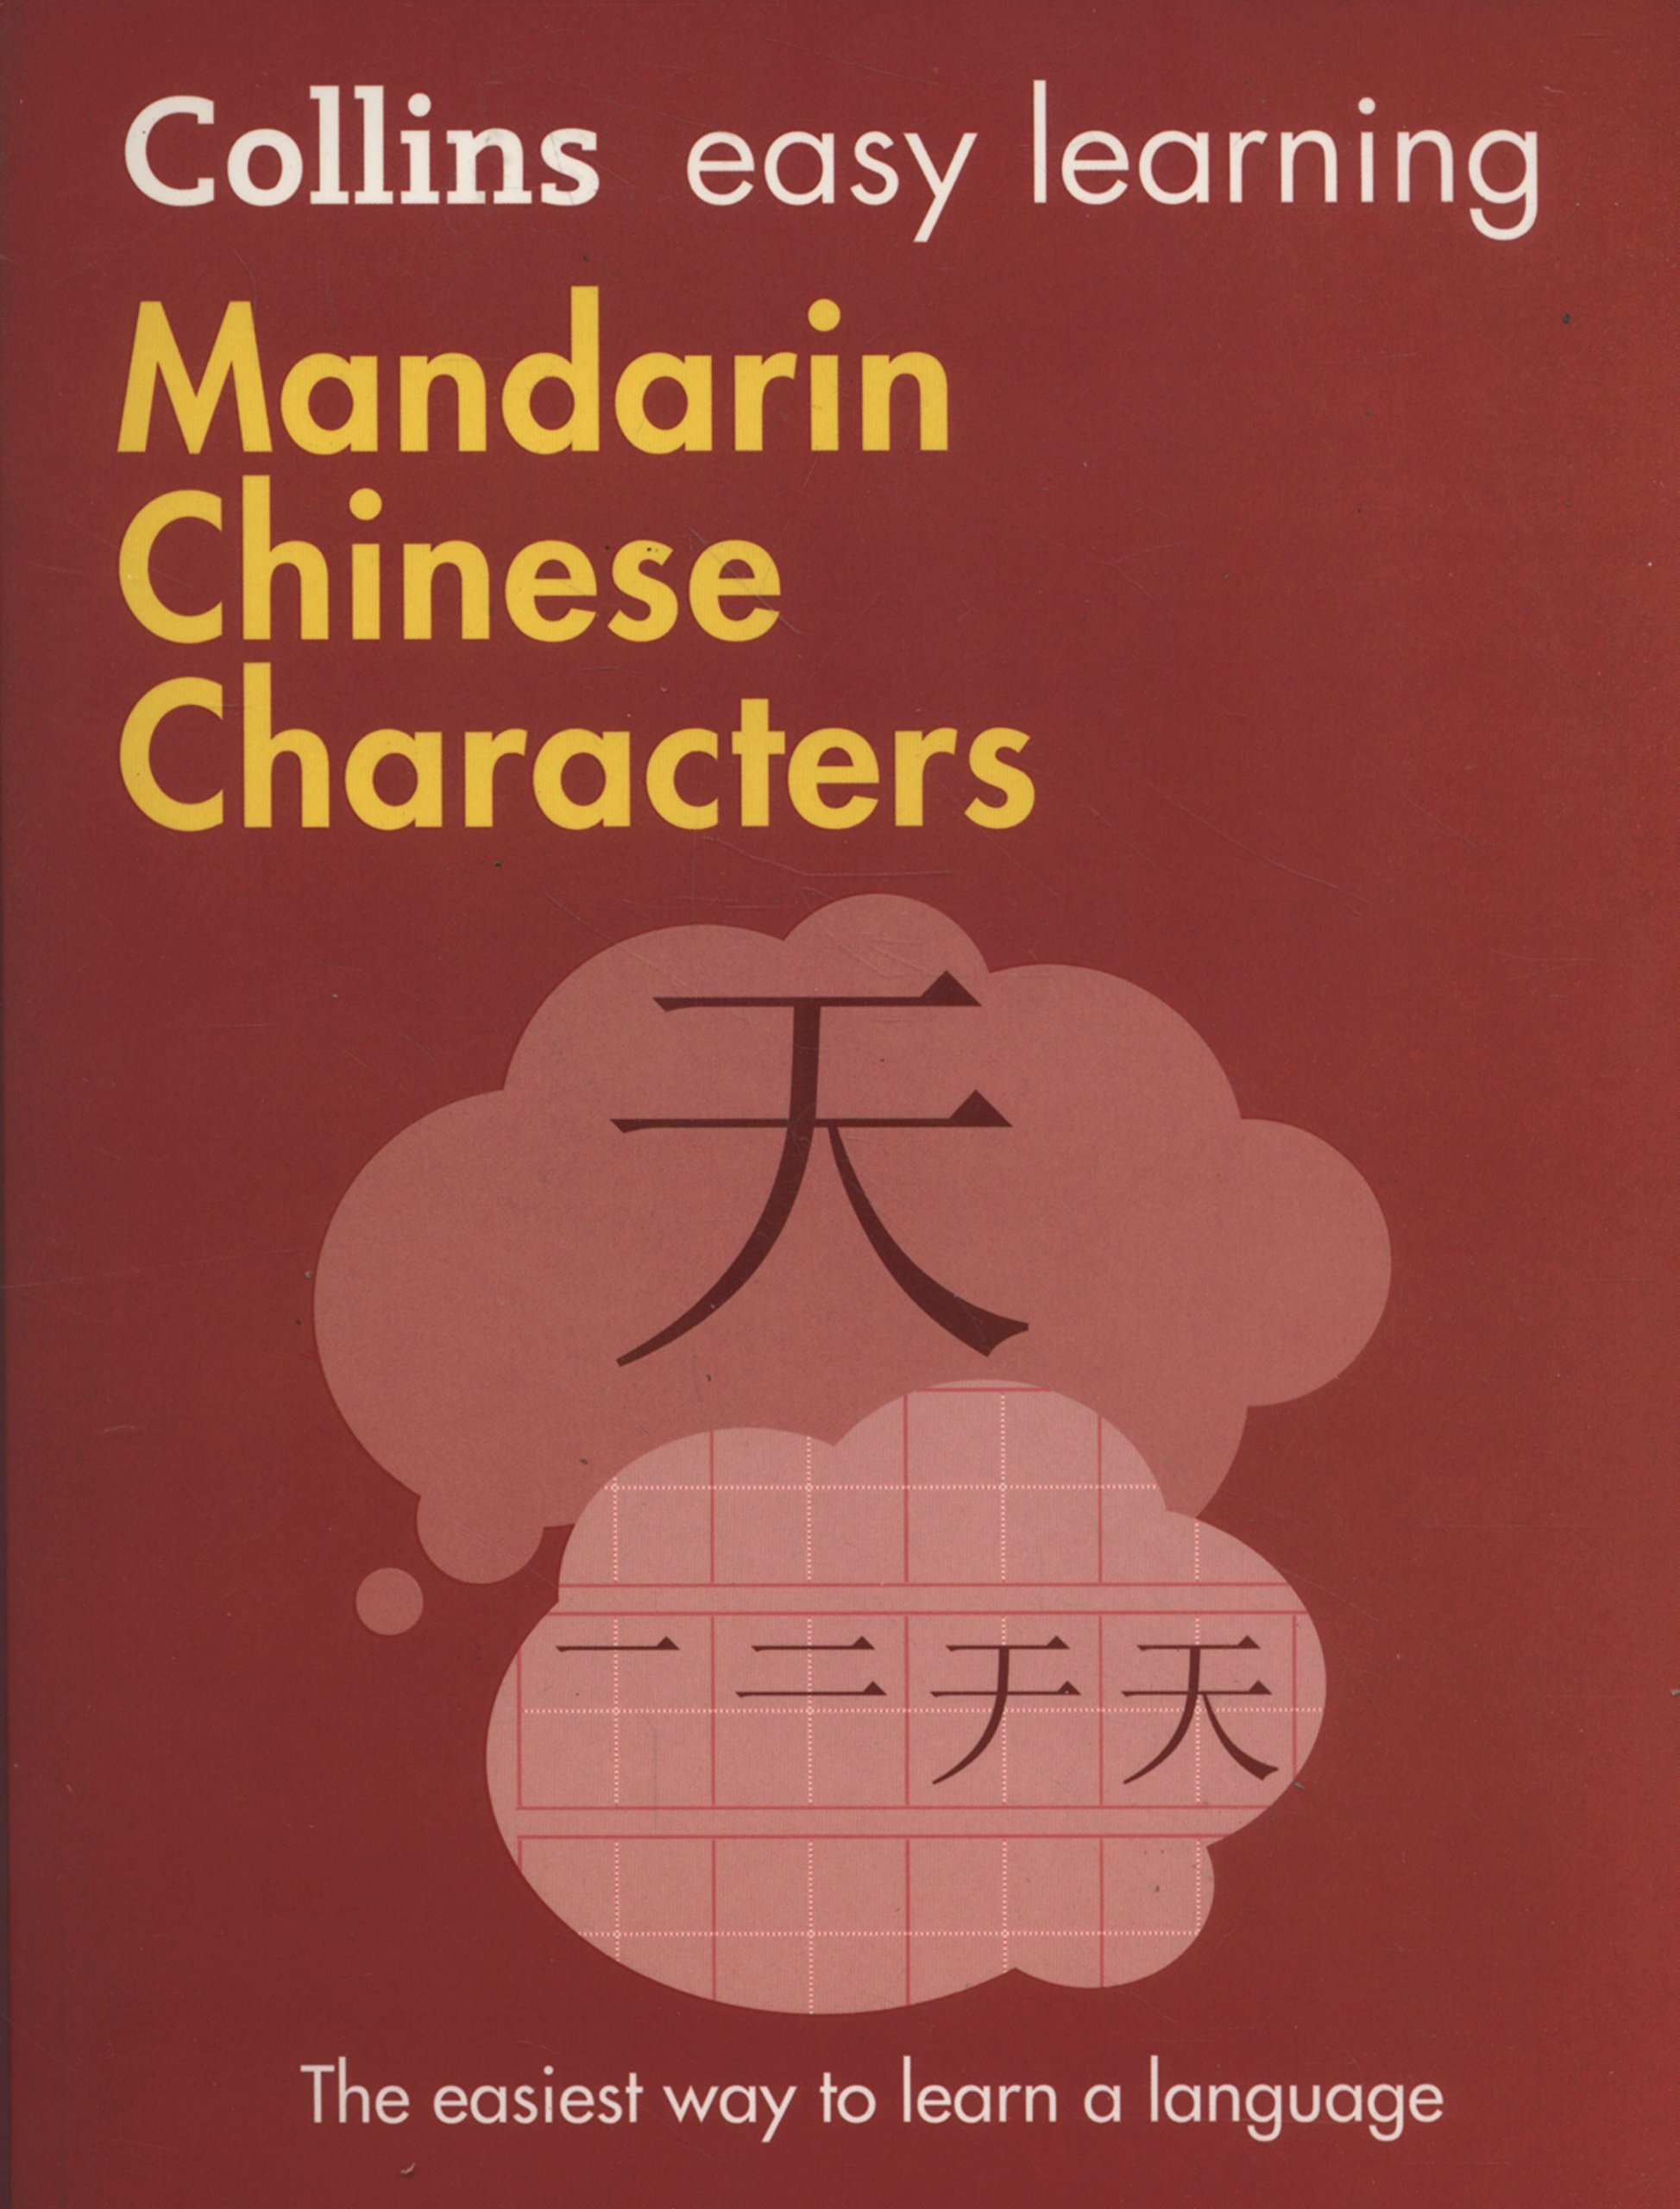 Mandarin Chinese Textbook Pdf